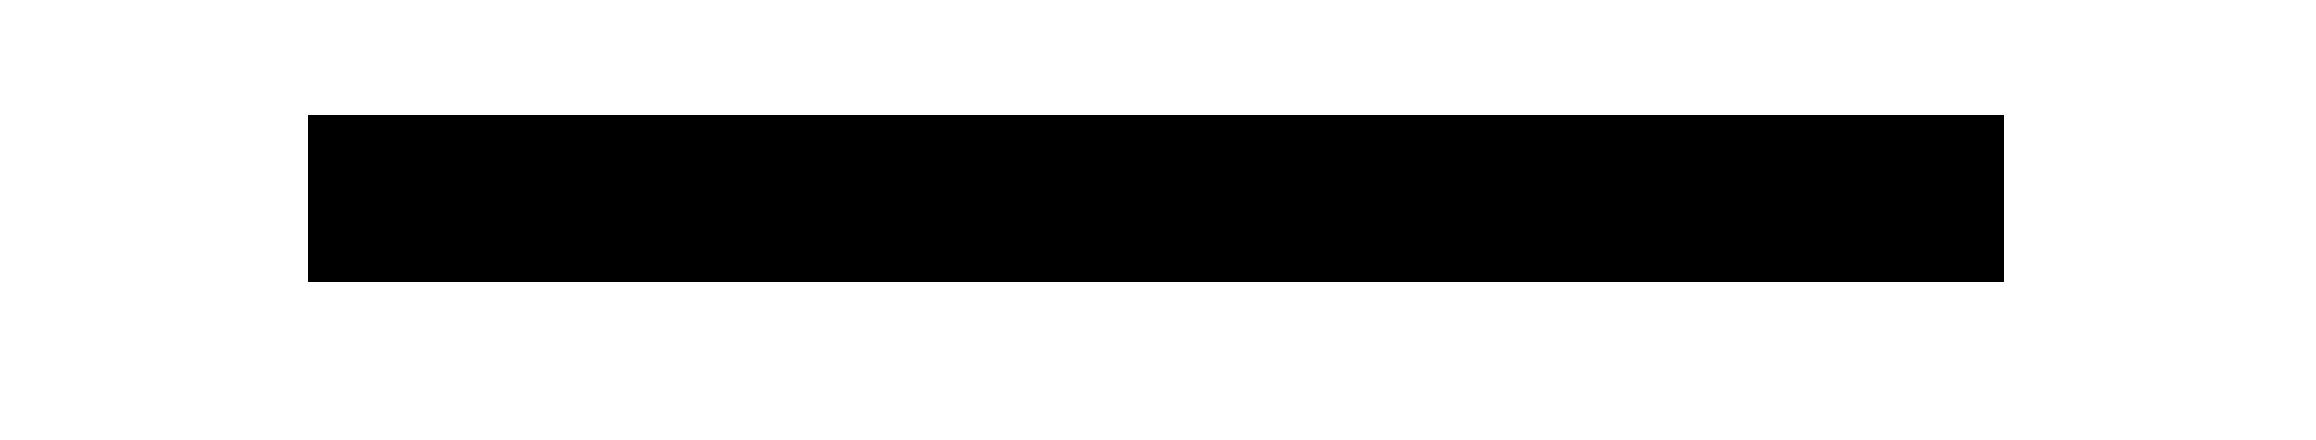 TRX_logo_banner.png